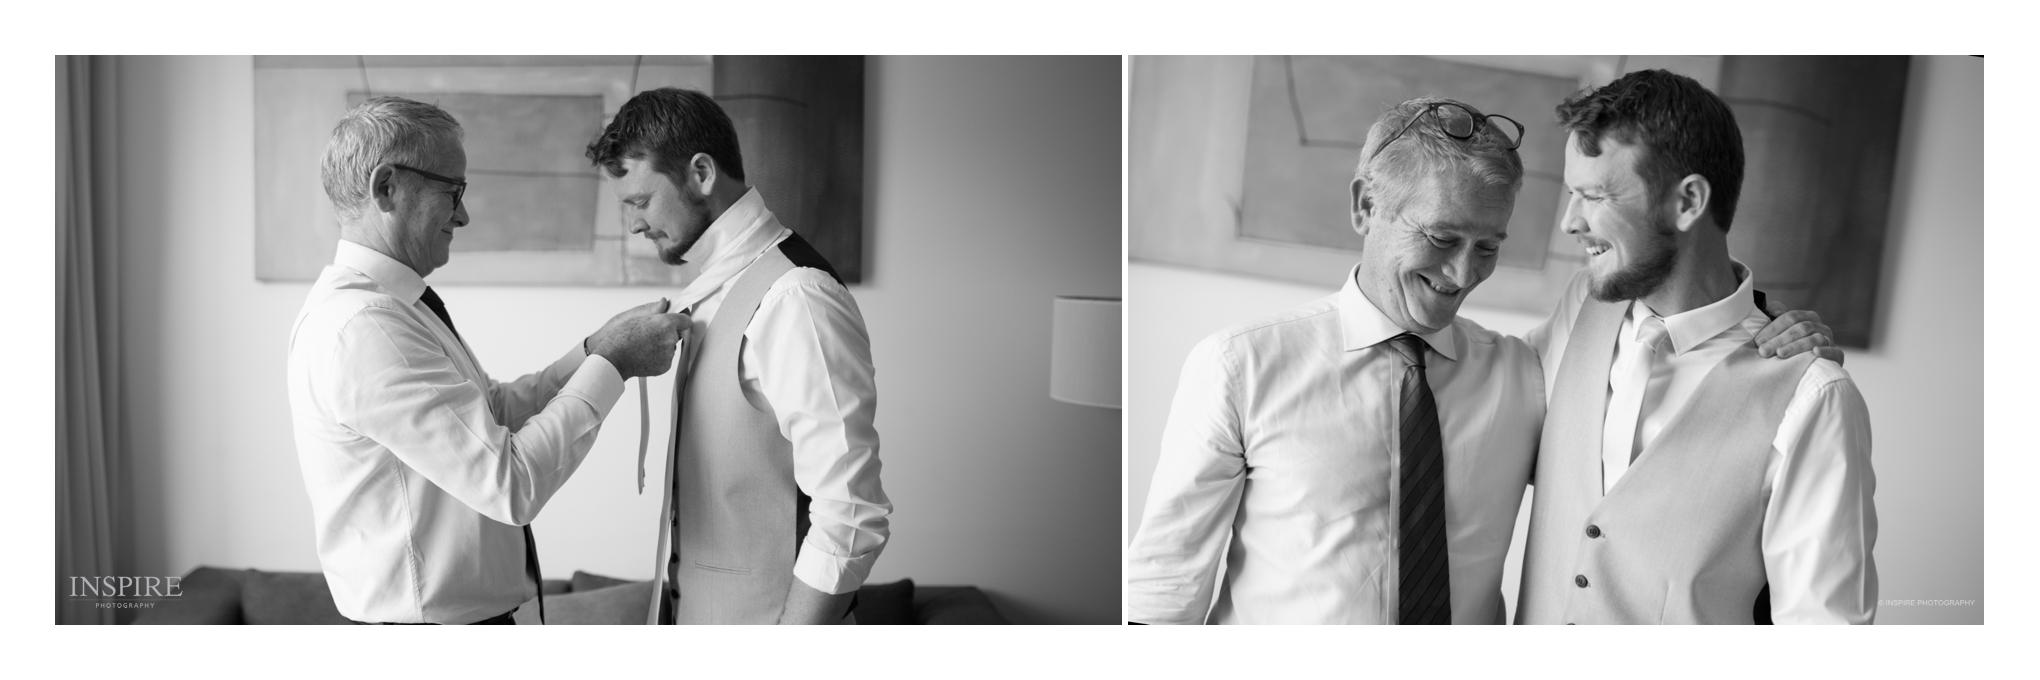 Nick & Bree wedding blog 2.jpg